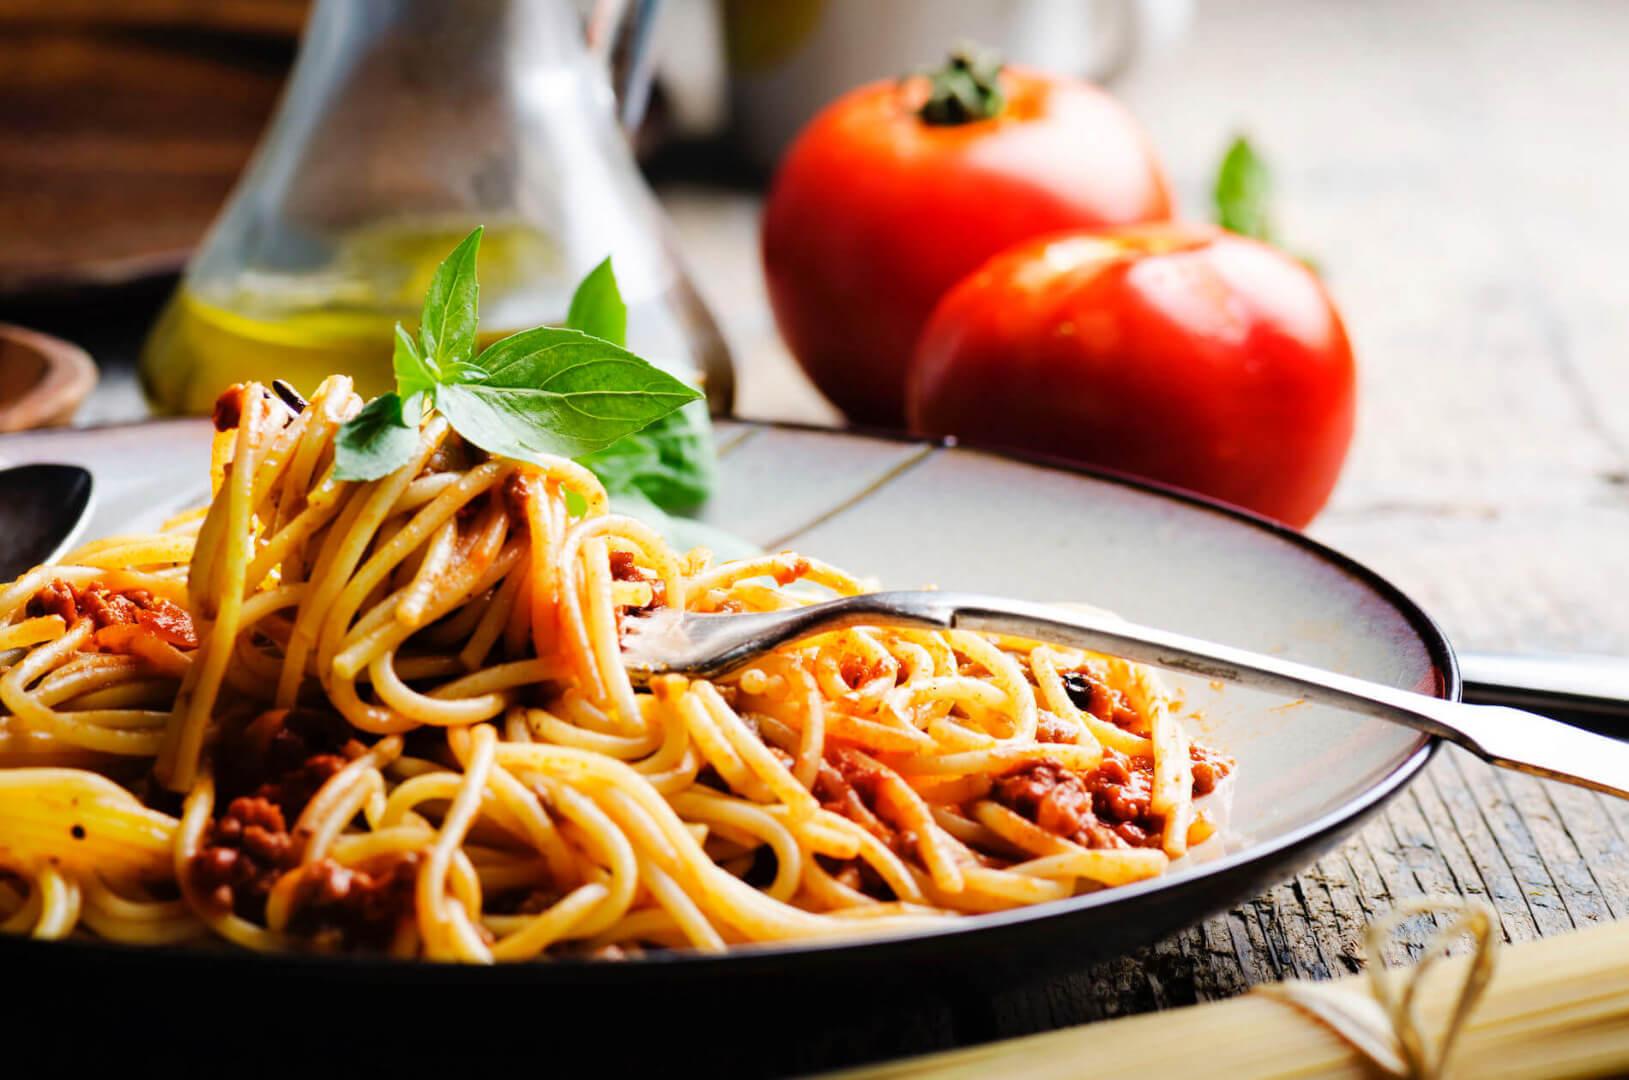 Spaghetti Pasta Meal